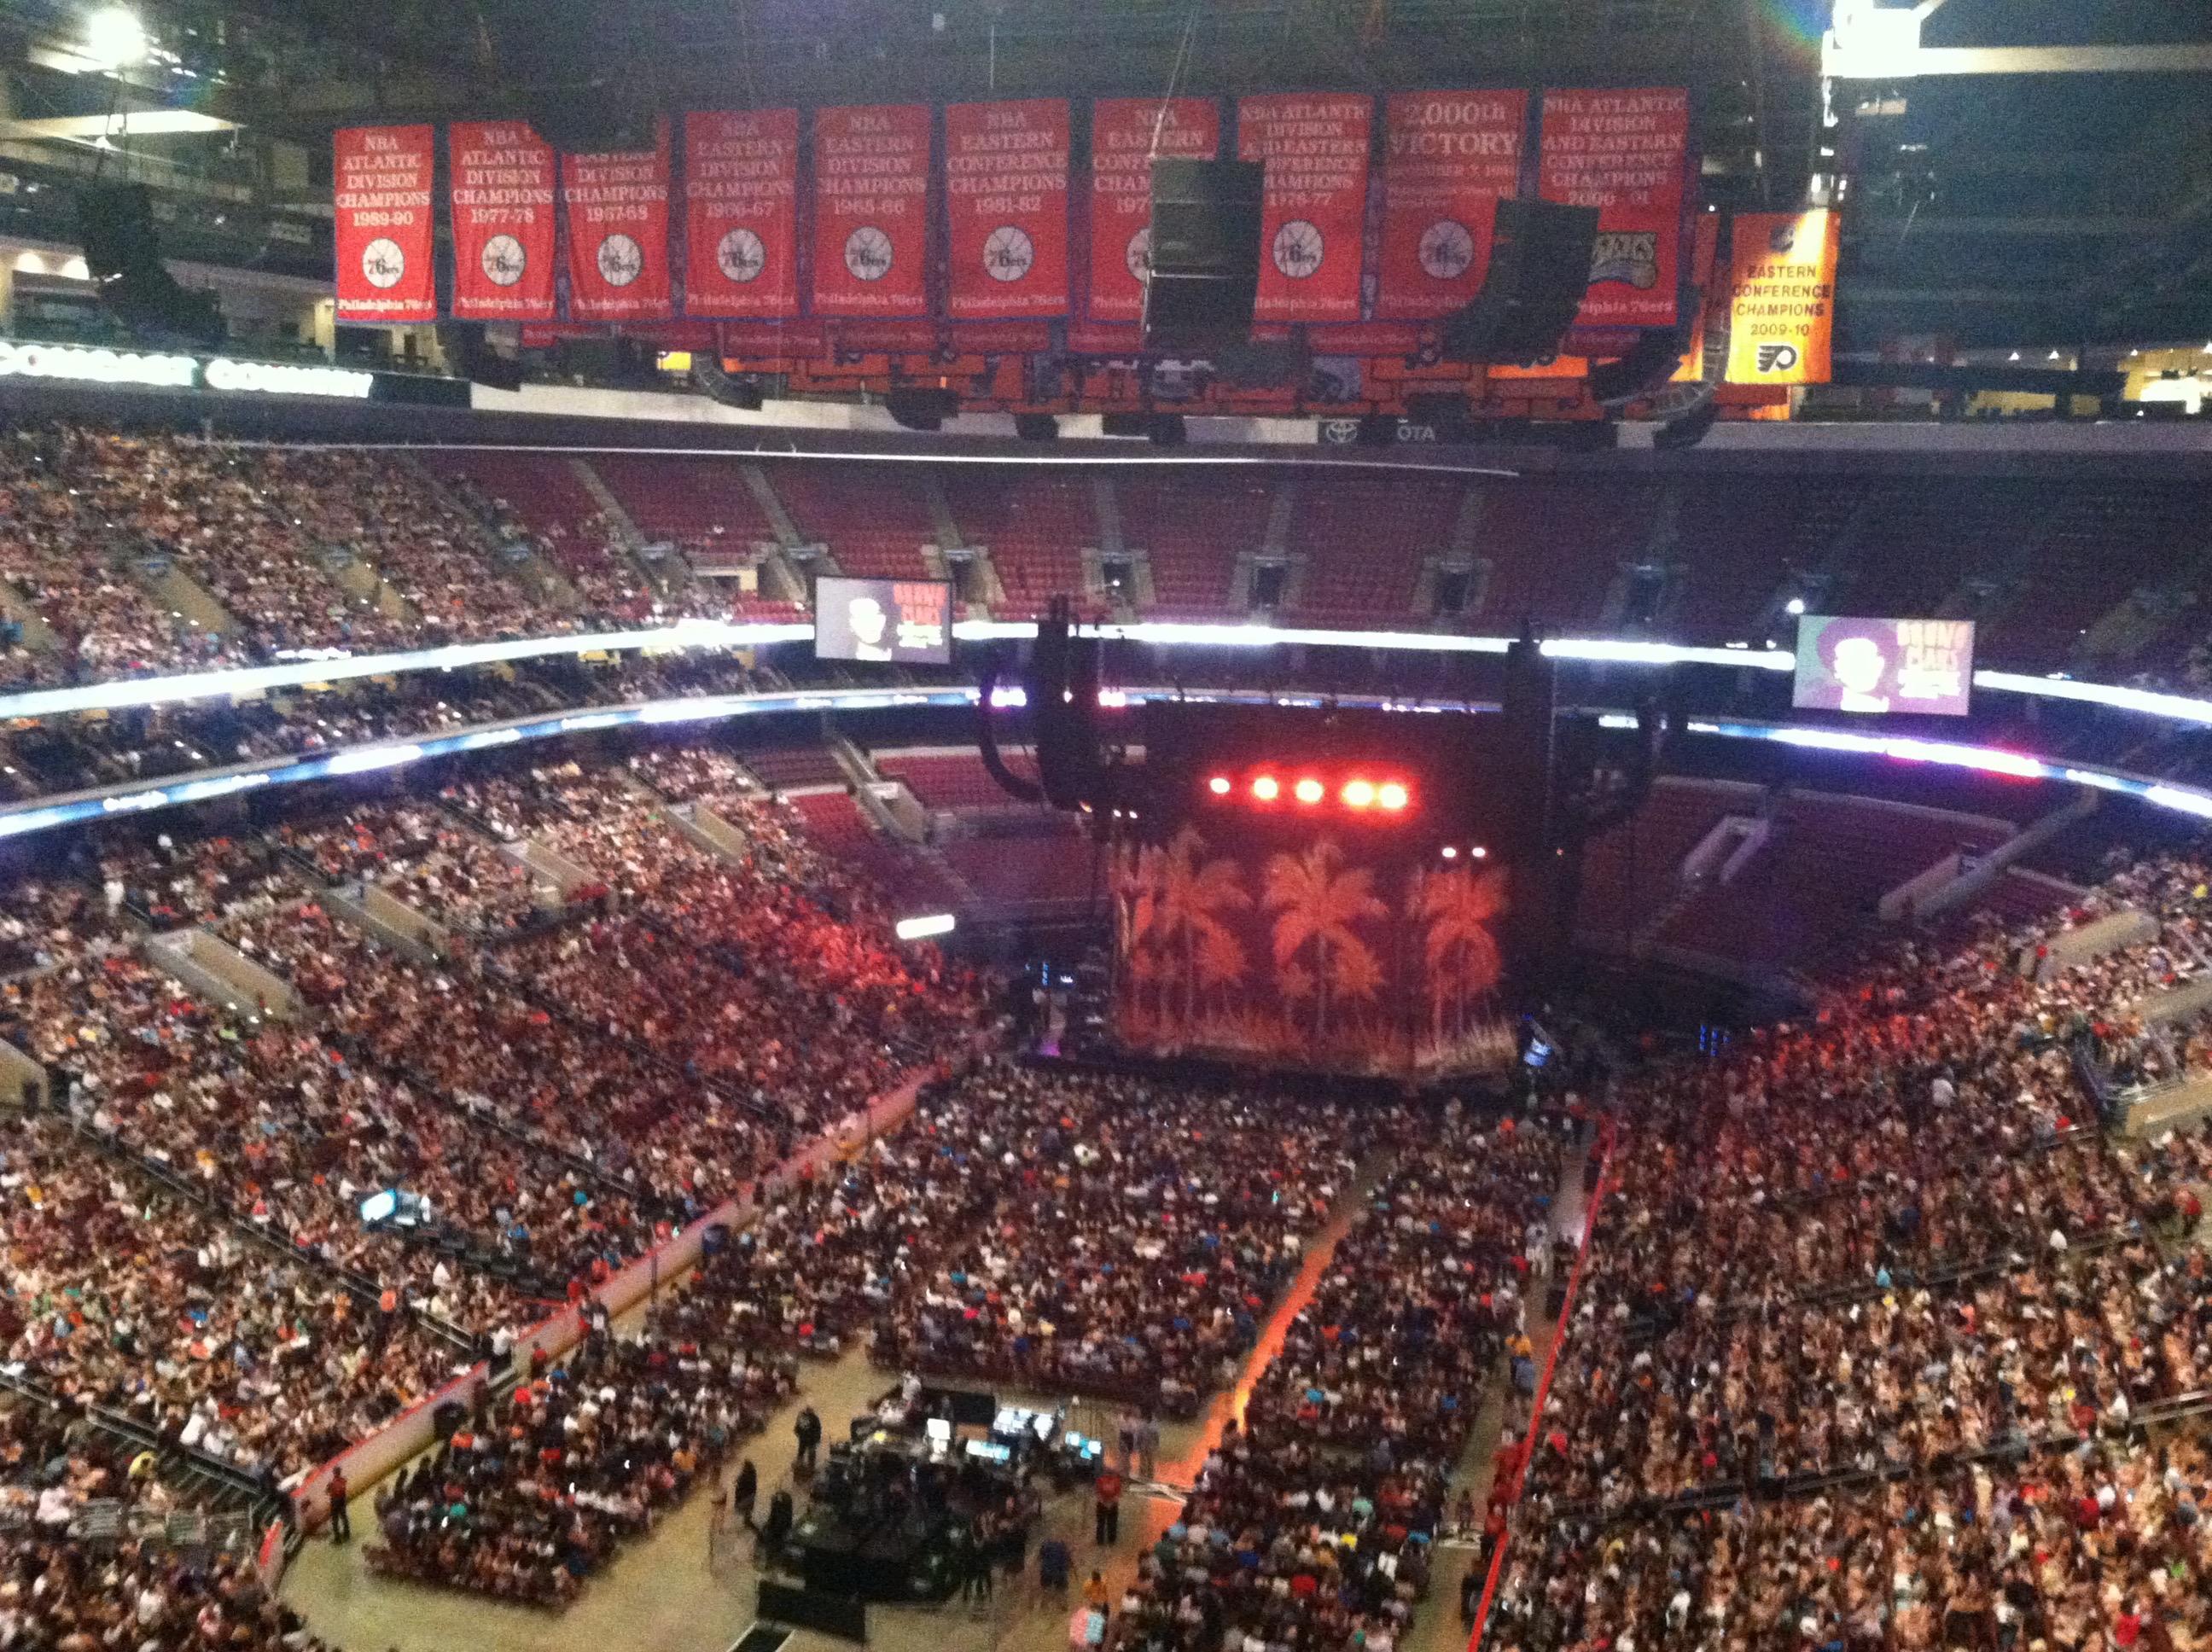 Wells Fargo Center Section 208 Concert Seating